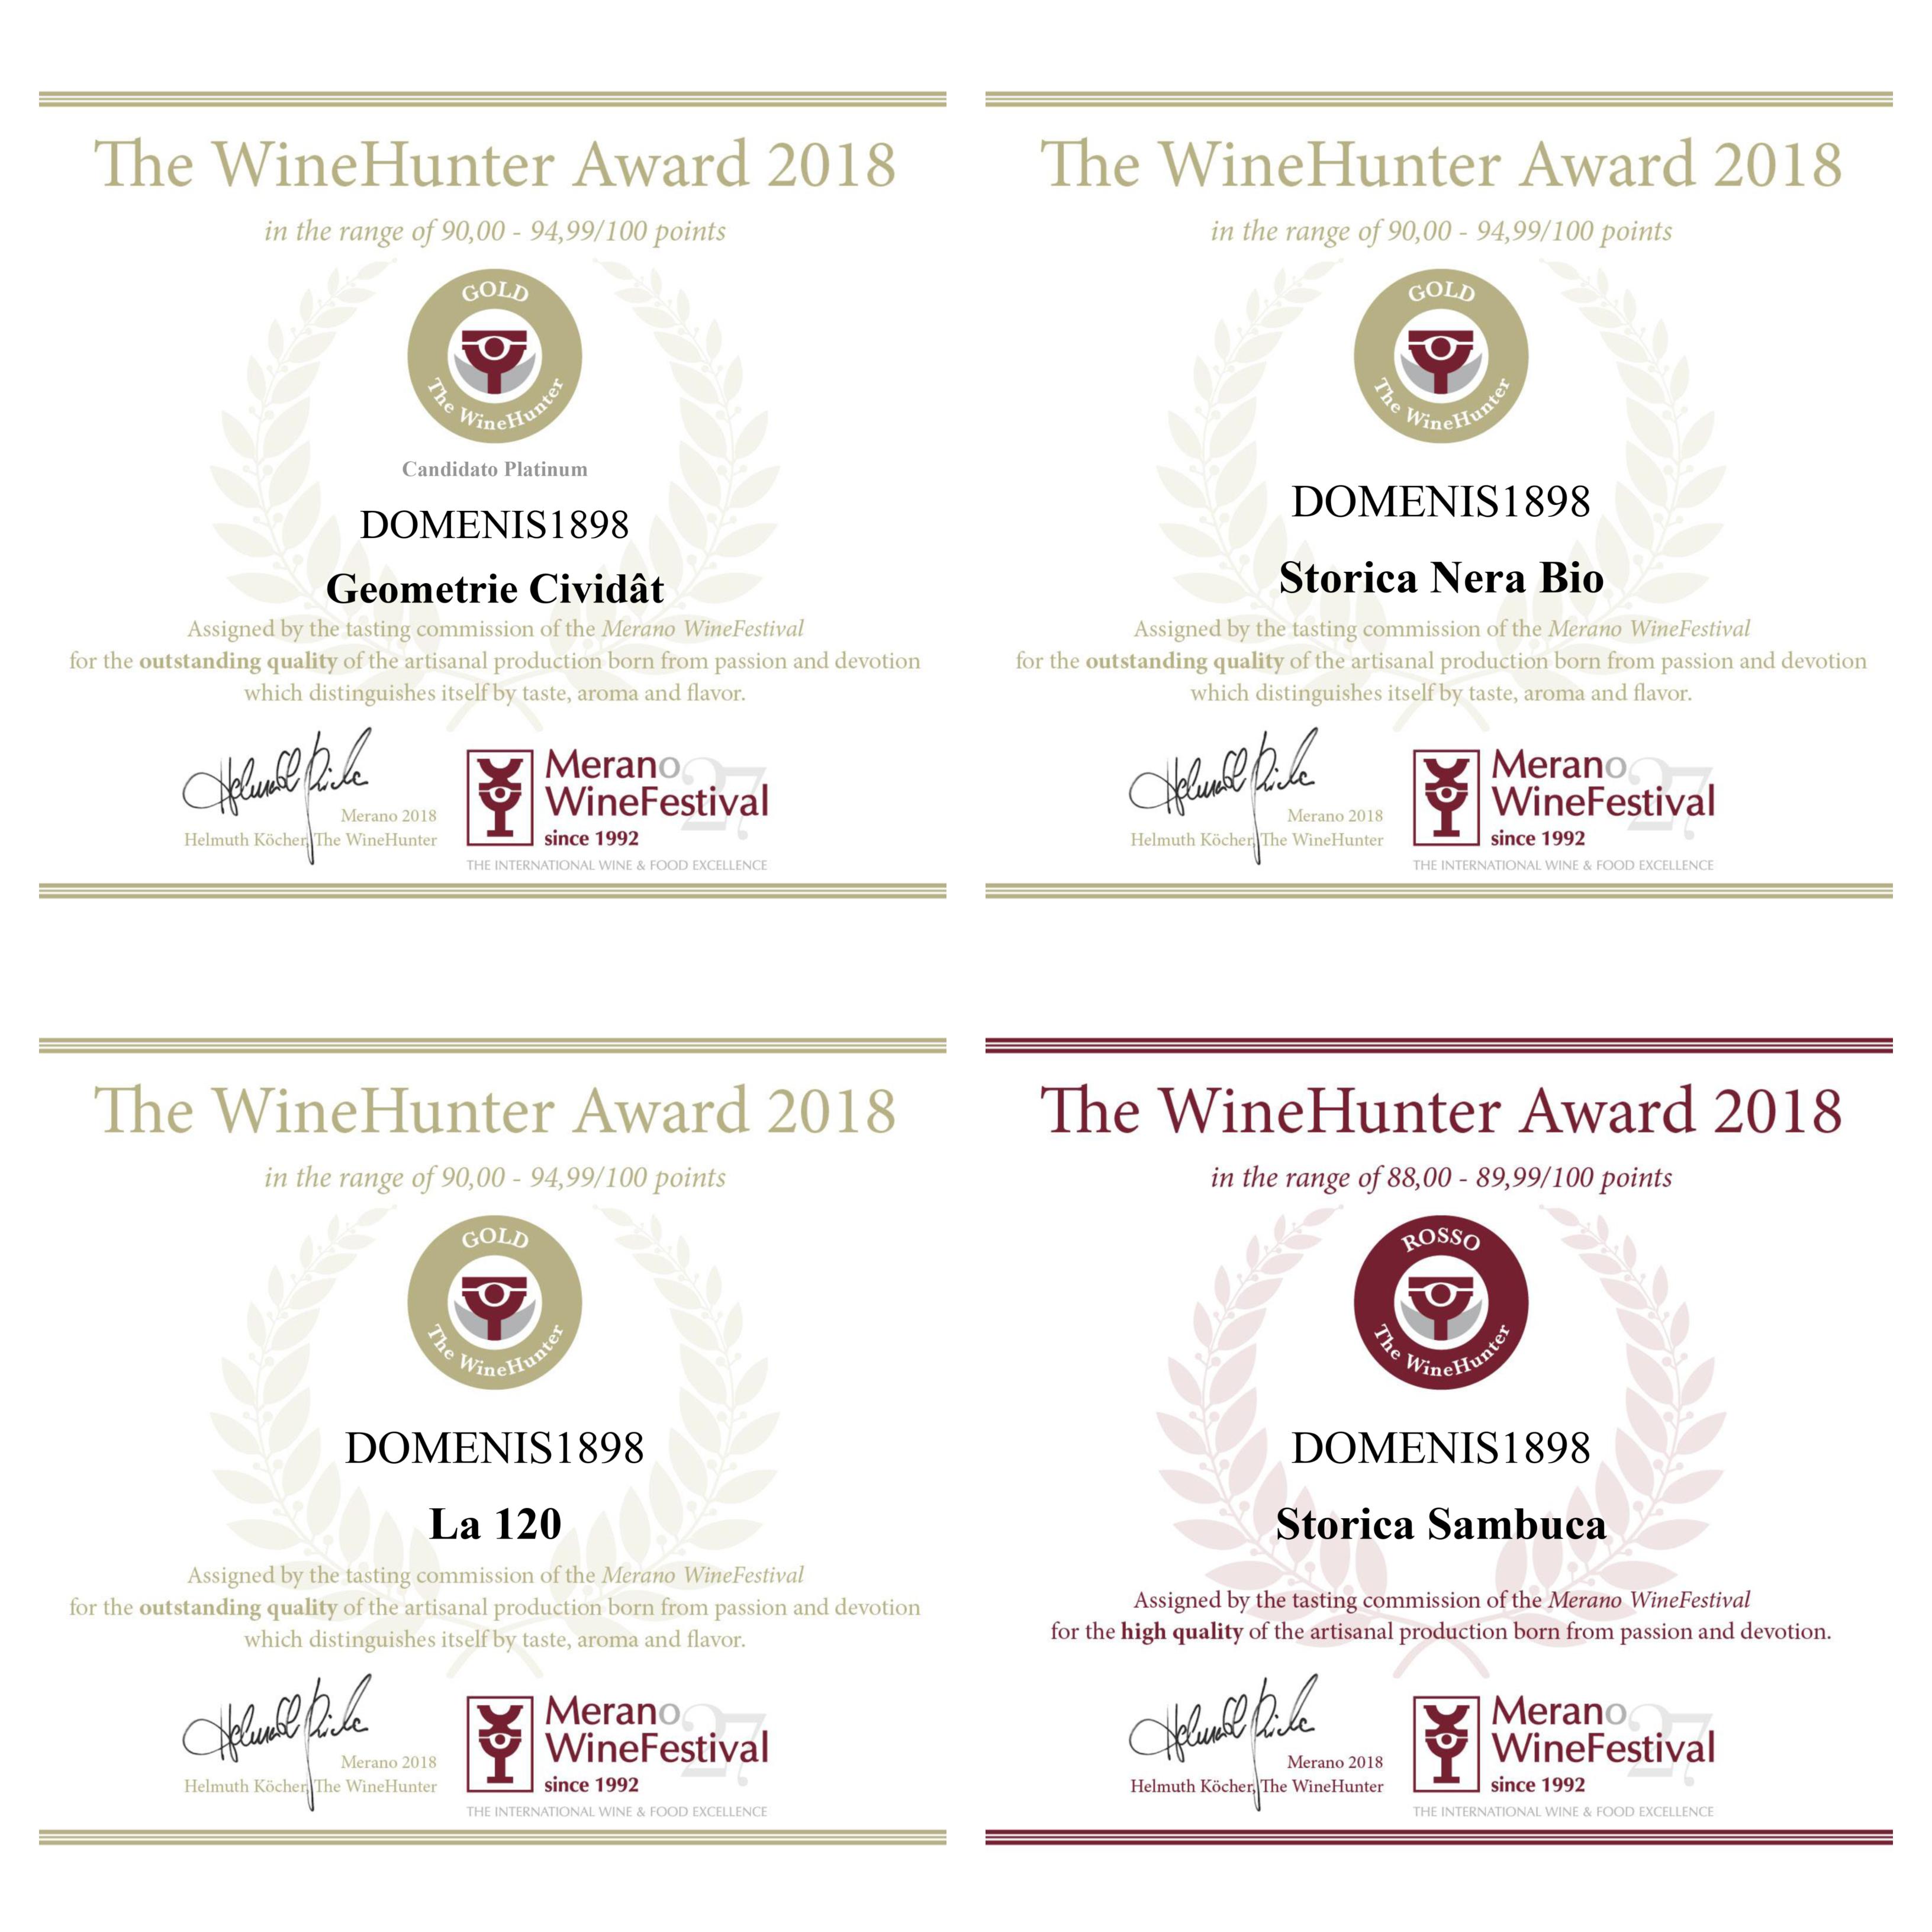 DOMENIS1898 tra i vincitori di The WineHunter Award 2018